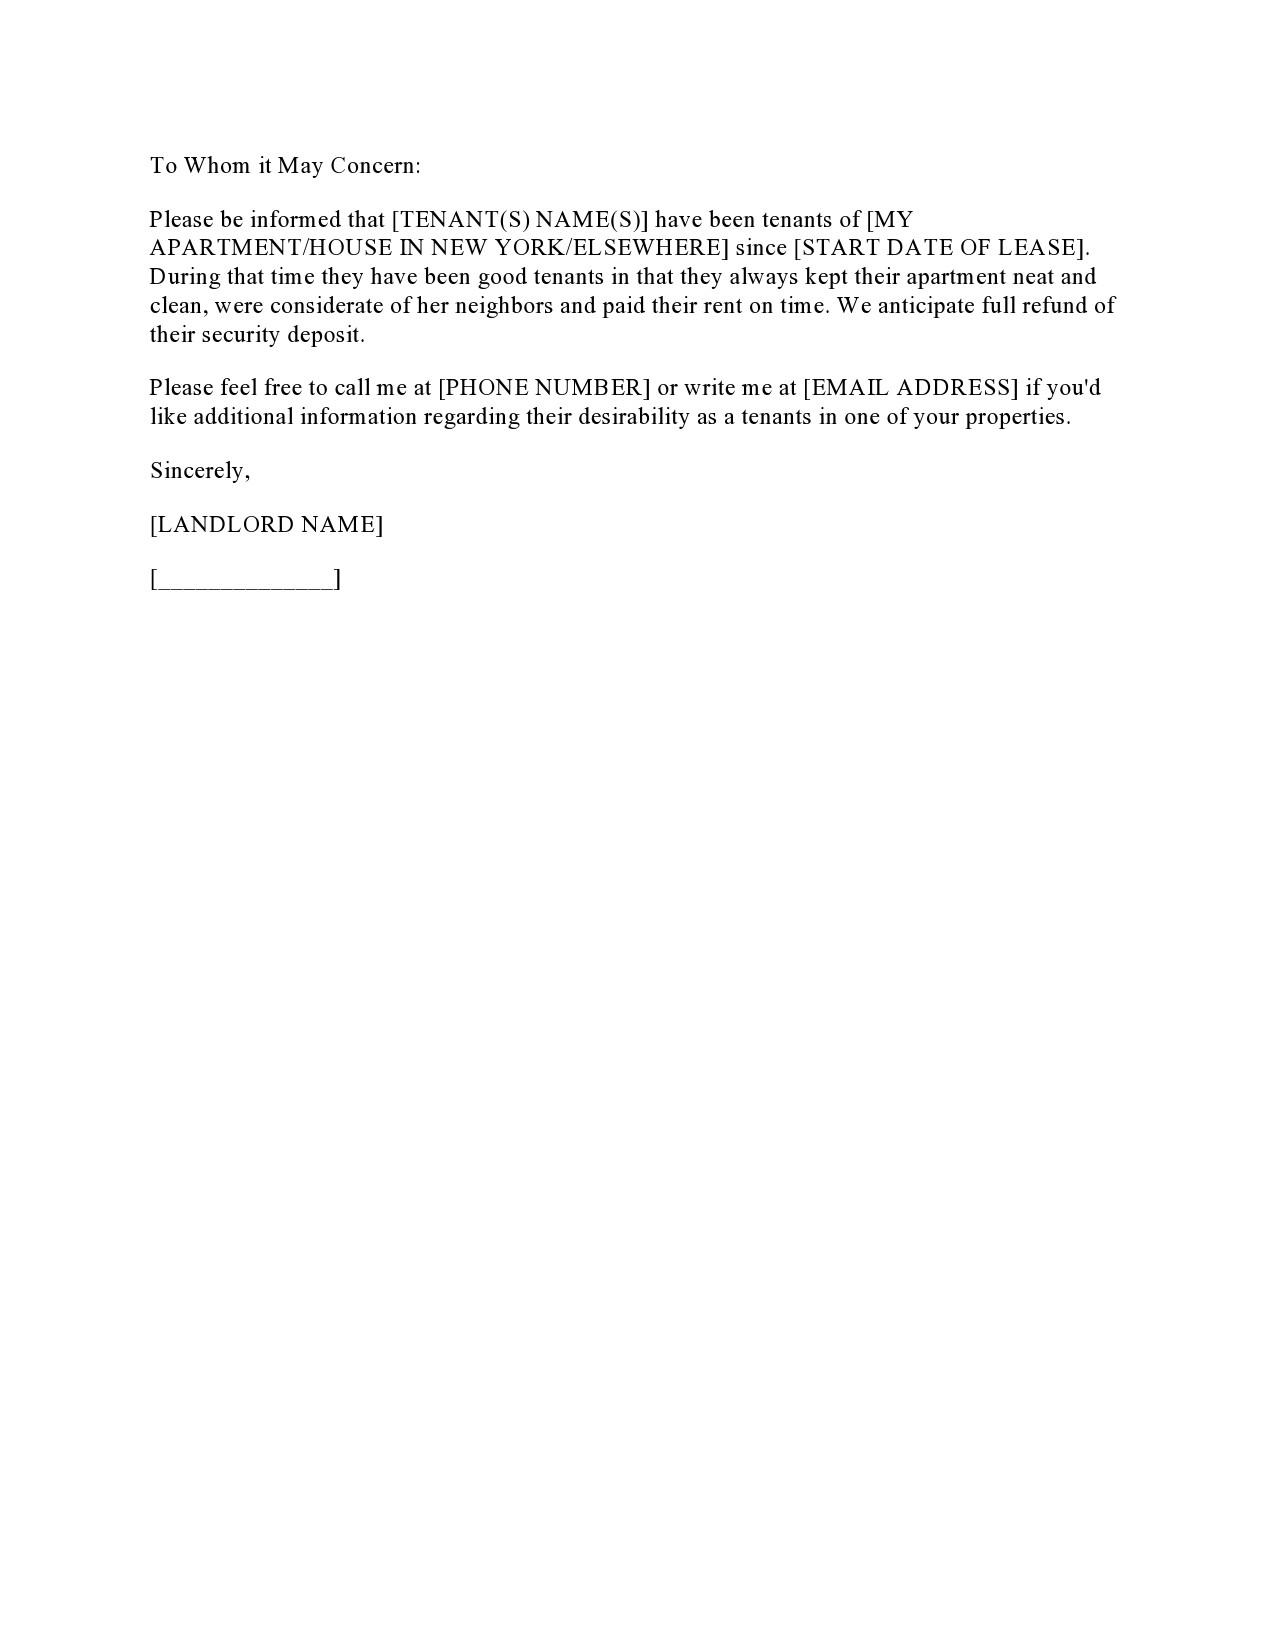 Free landlord statment 23